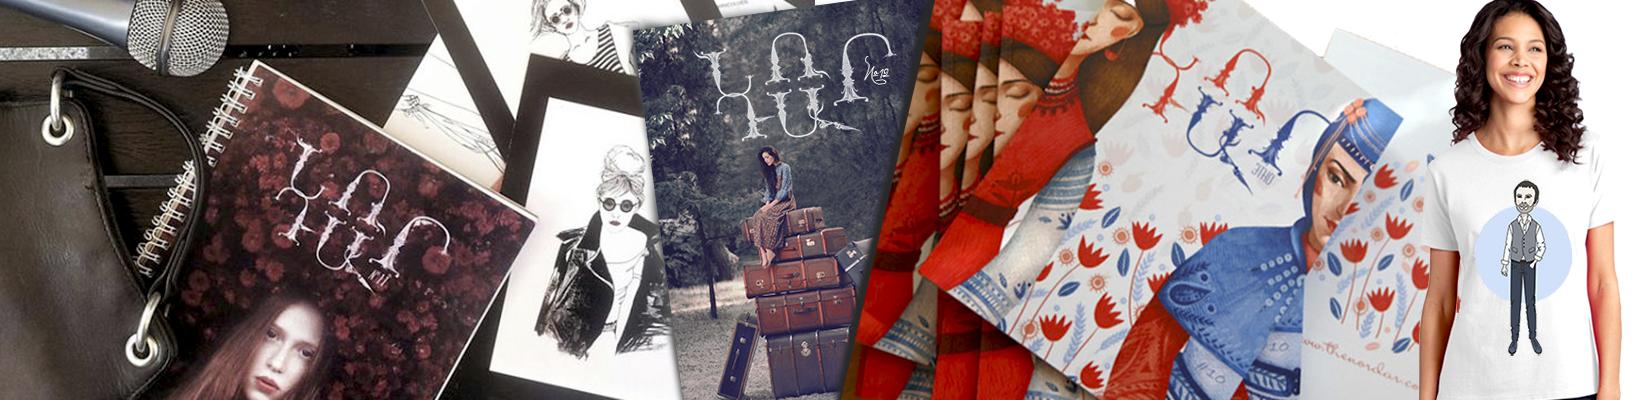 magazine-o-proekte-web-jpg